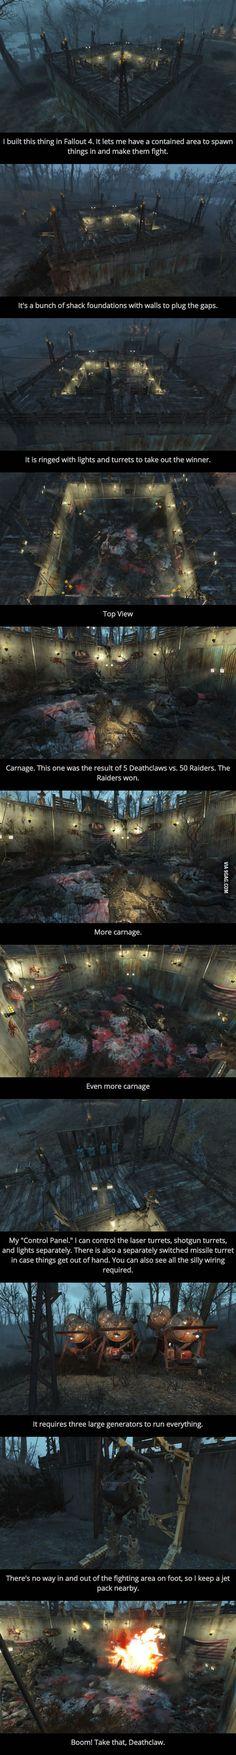 Fallout 4 Arena